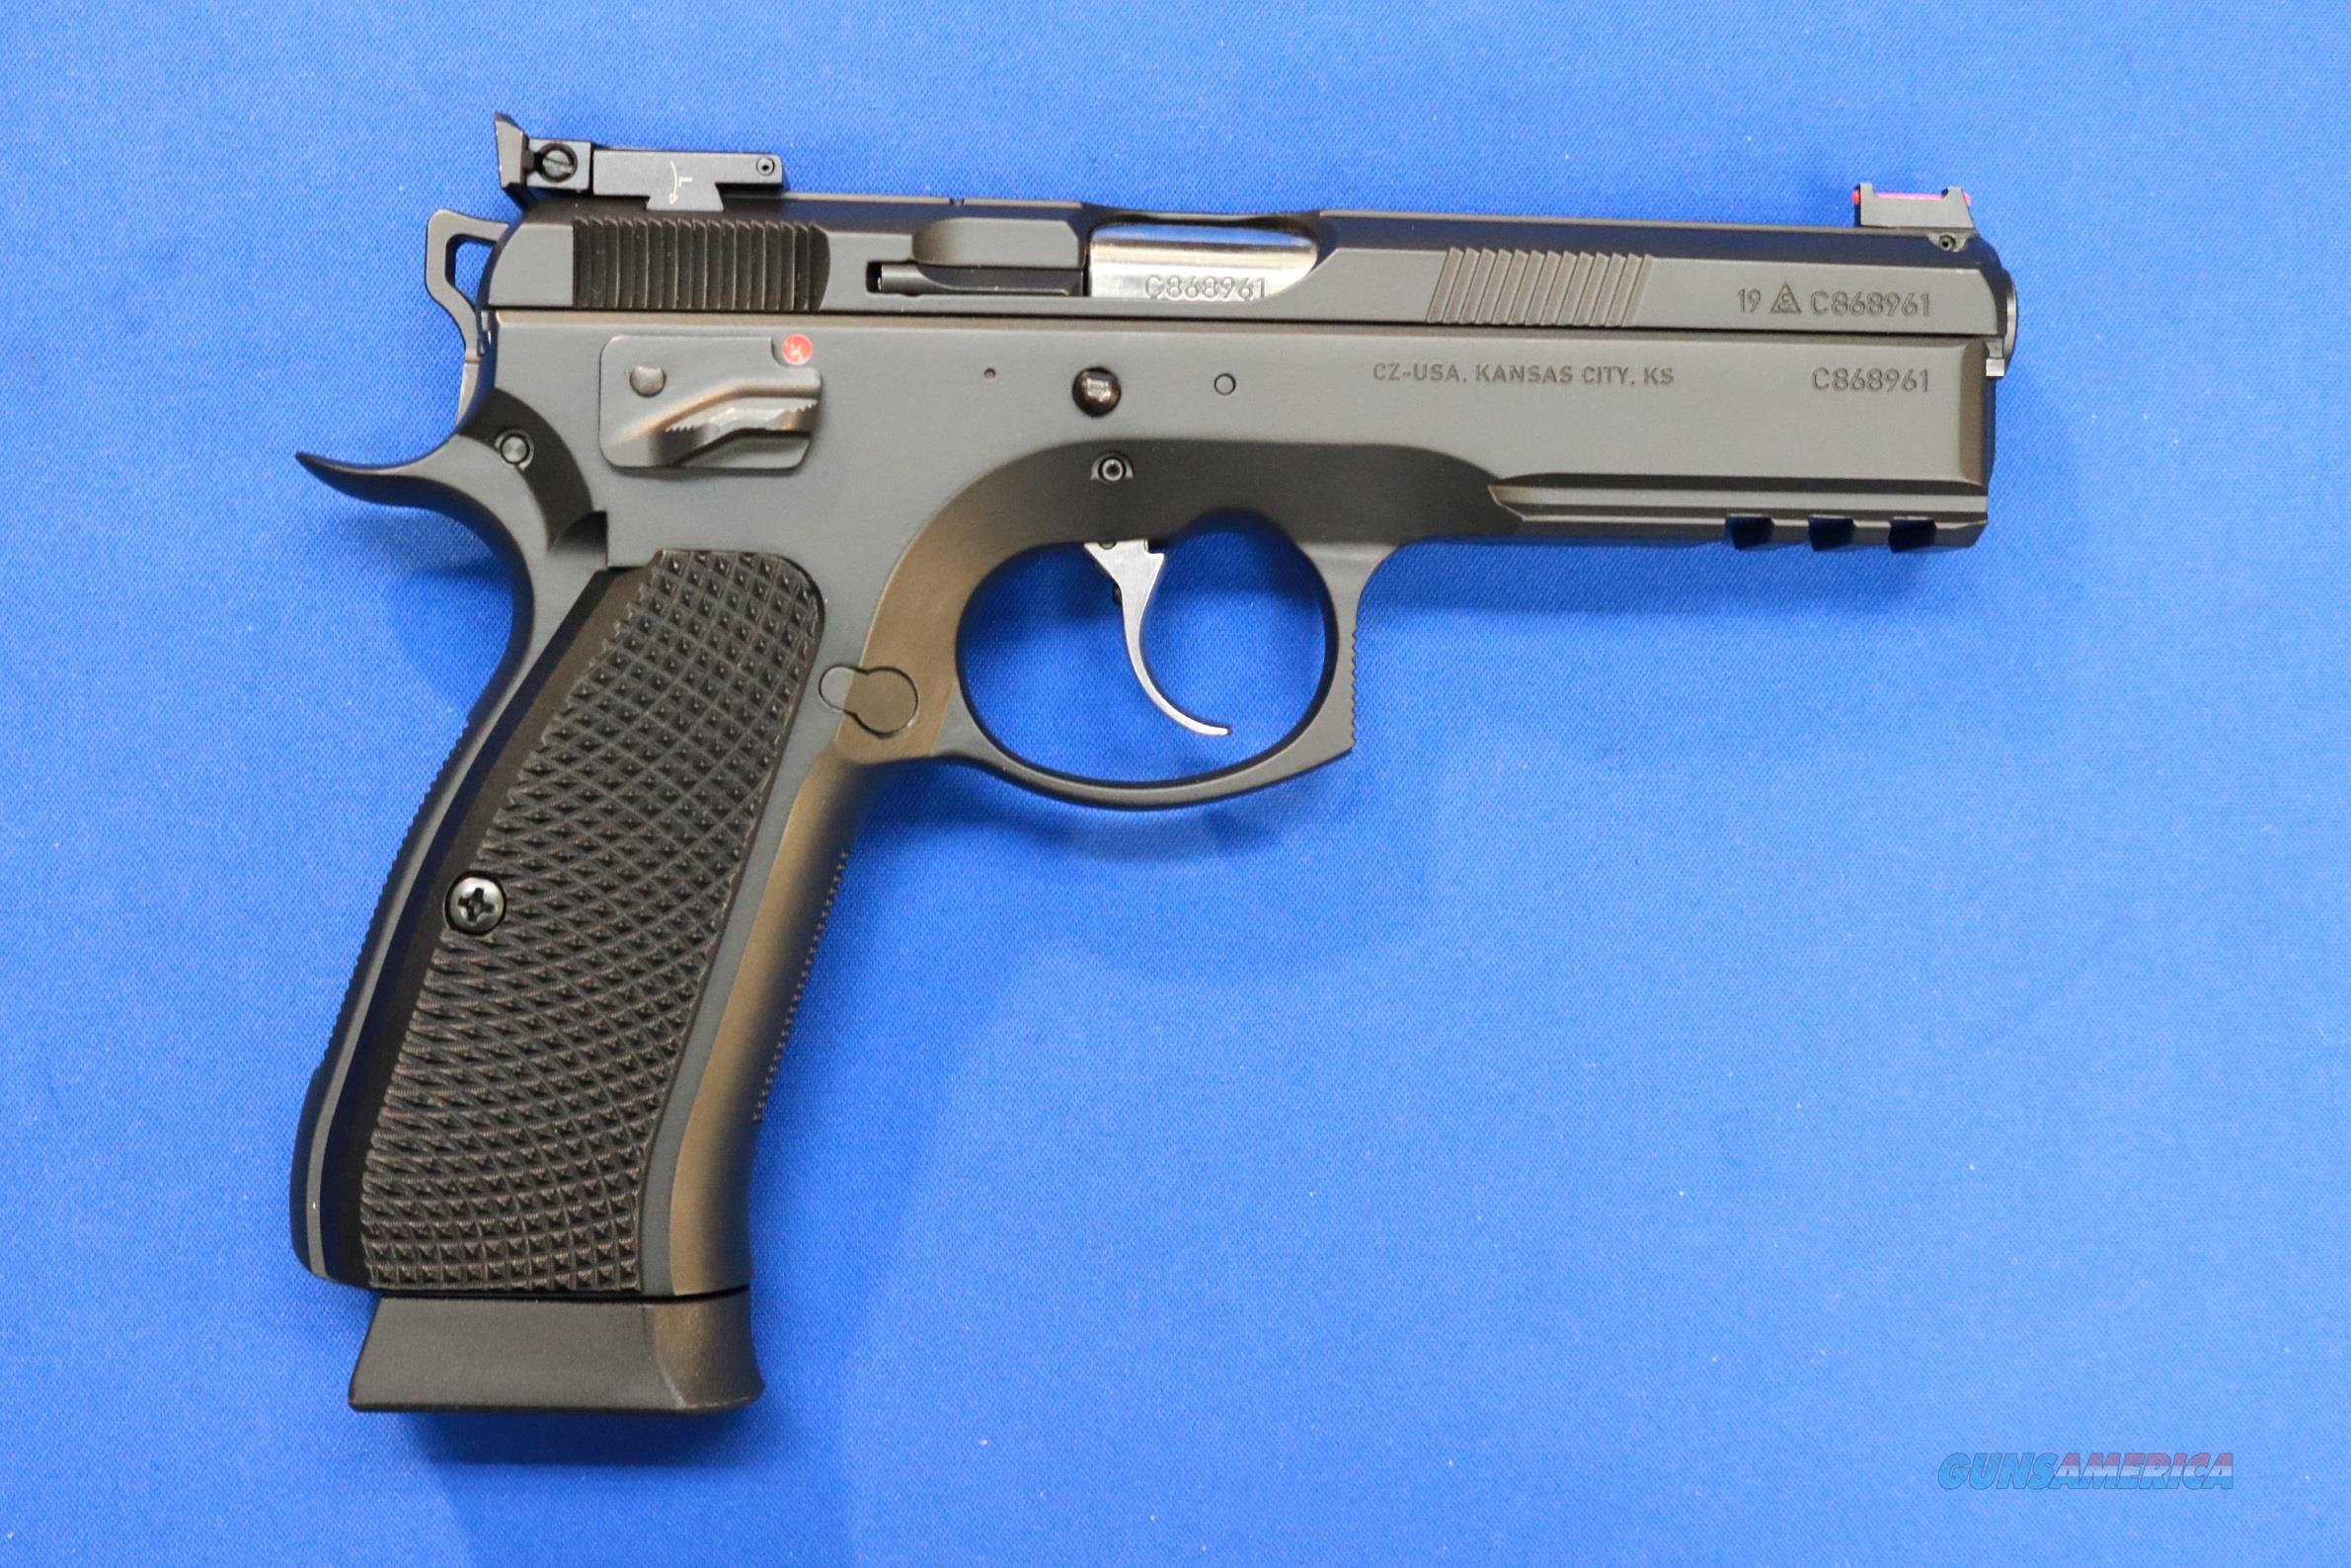 CZ-USA CZ 75 SP-01 SHADOW 9mm - NEW w/3 18-RD MAGS  Guns > Pistols > CZ Pistols